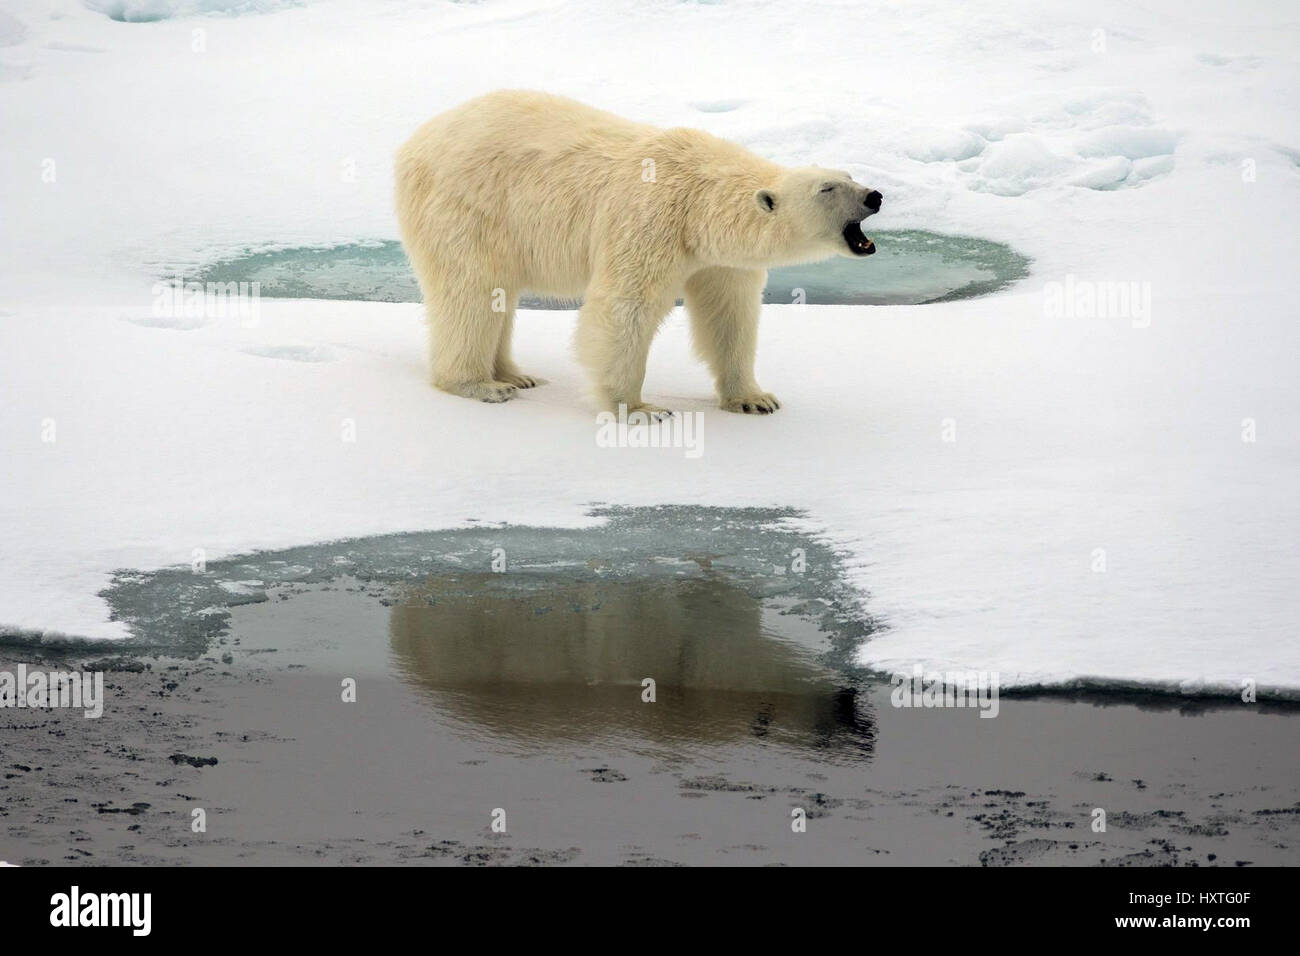 Alexandra Land, Russia. 29th Mar, 2017. A polar bear roars at Severnaya Bay on Alexandra Land March 29, 2017 in - Stock Image